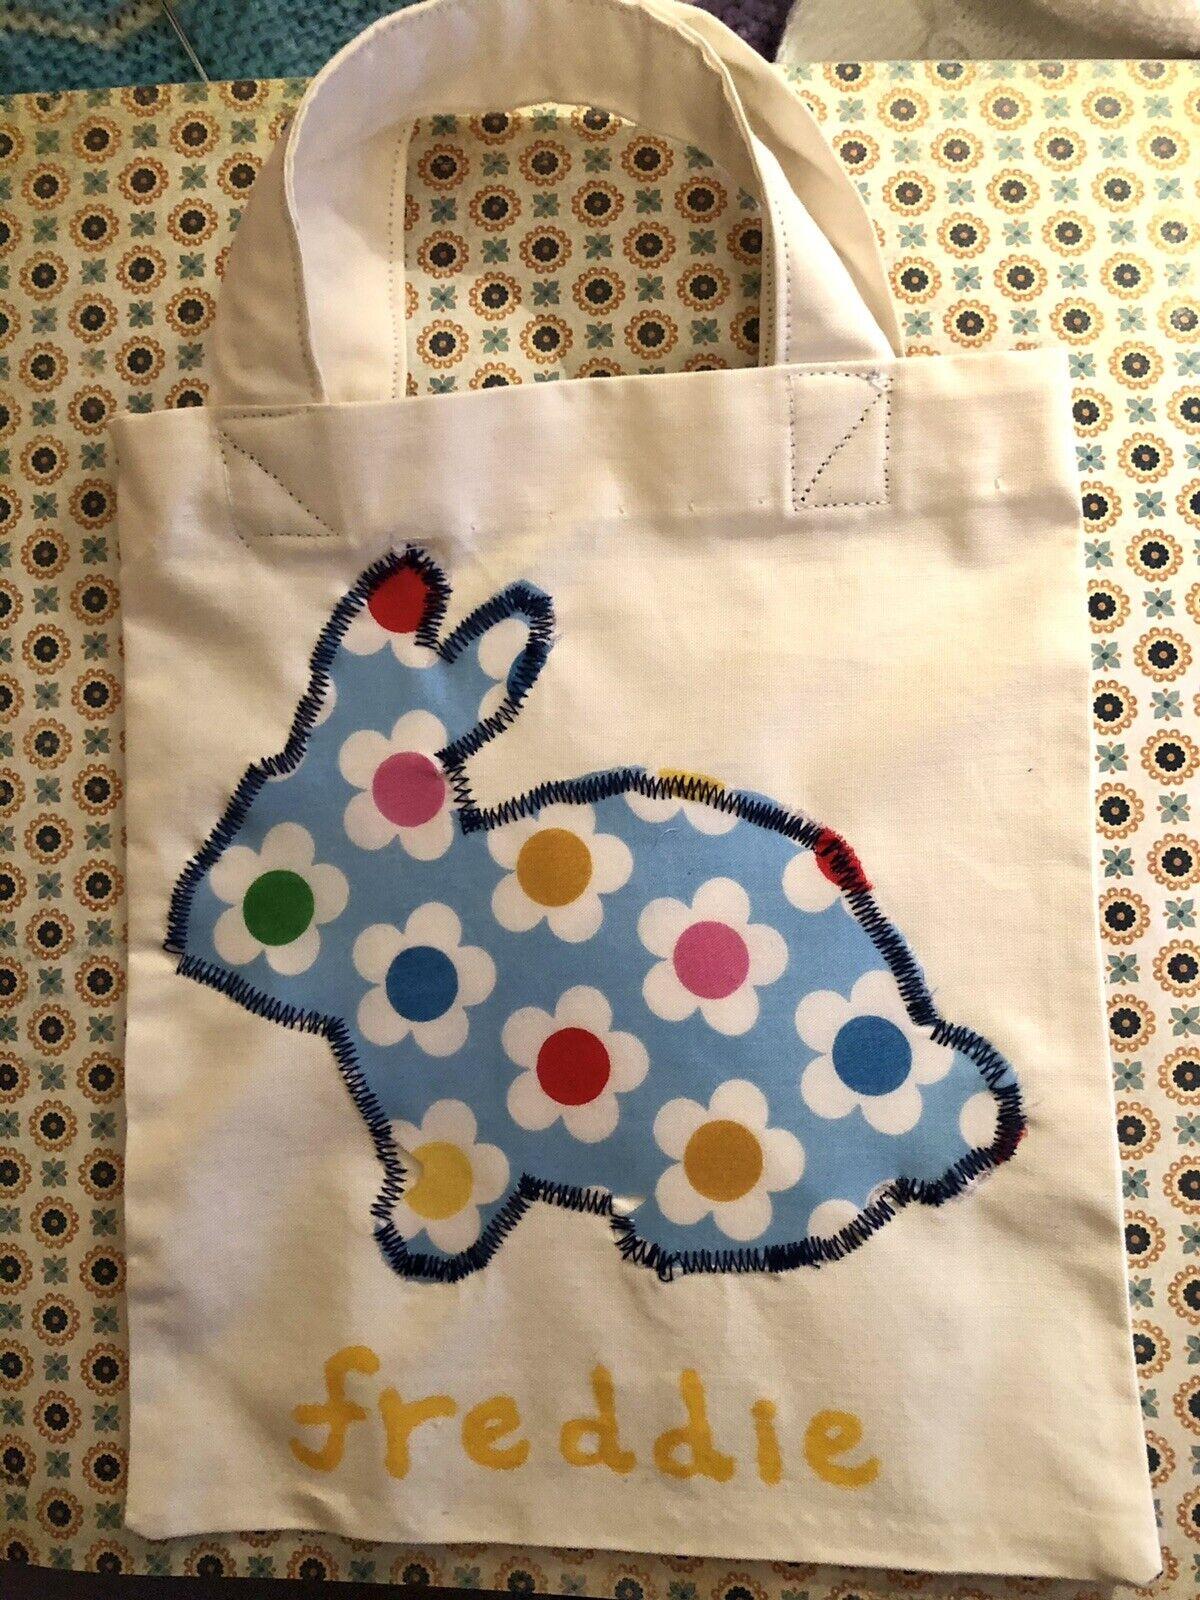 Handmade Child's Mini Easter Egg Hunt Gift Treats Bag Personalised 🐣 Appliqué